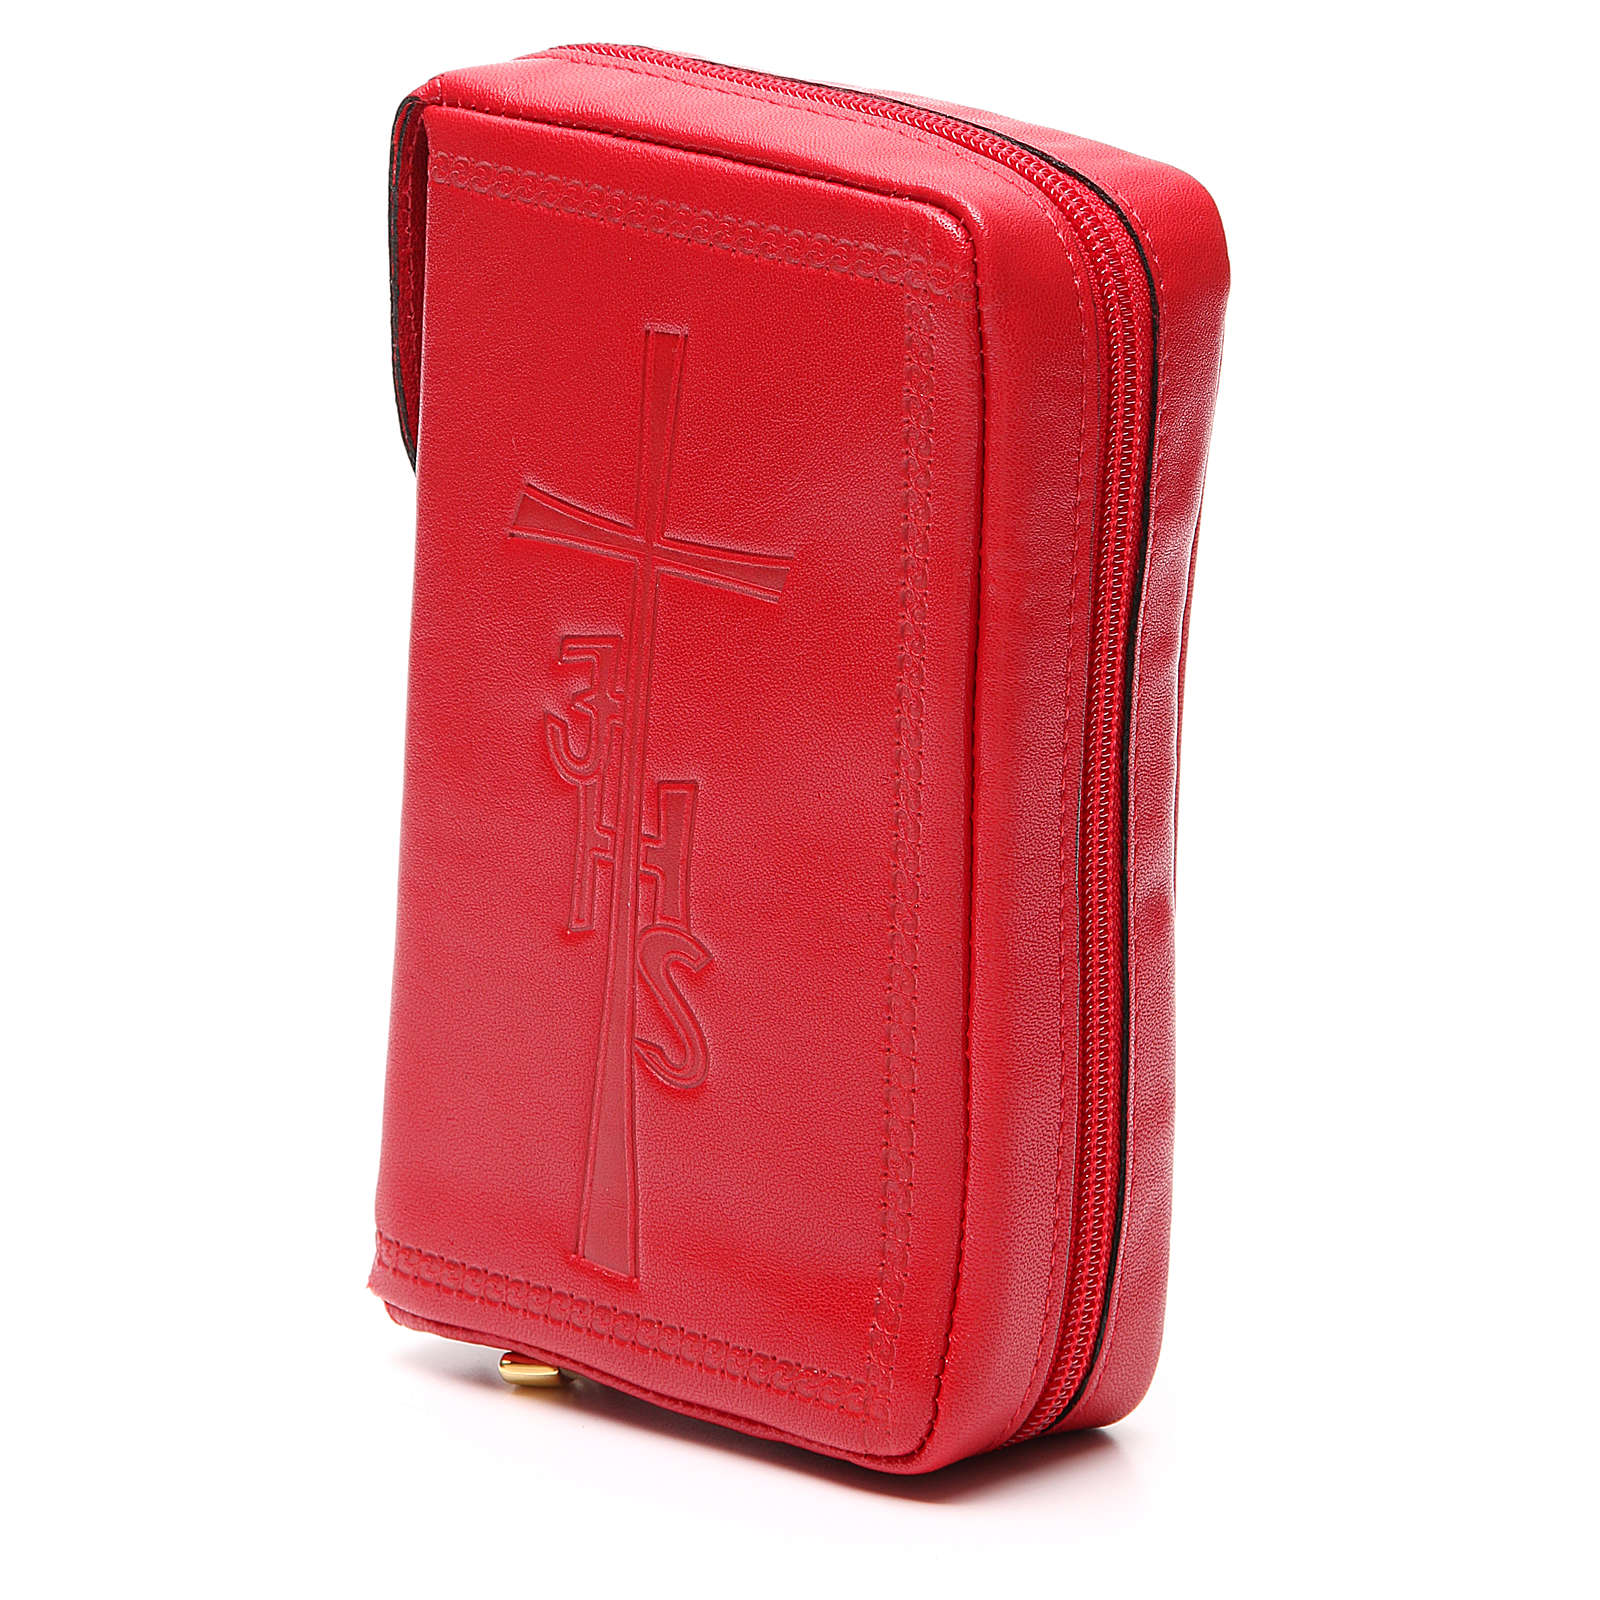 Custodia Lit Ore vol unico pelle rossa croce IHS zip 4